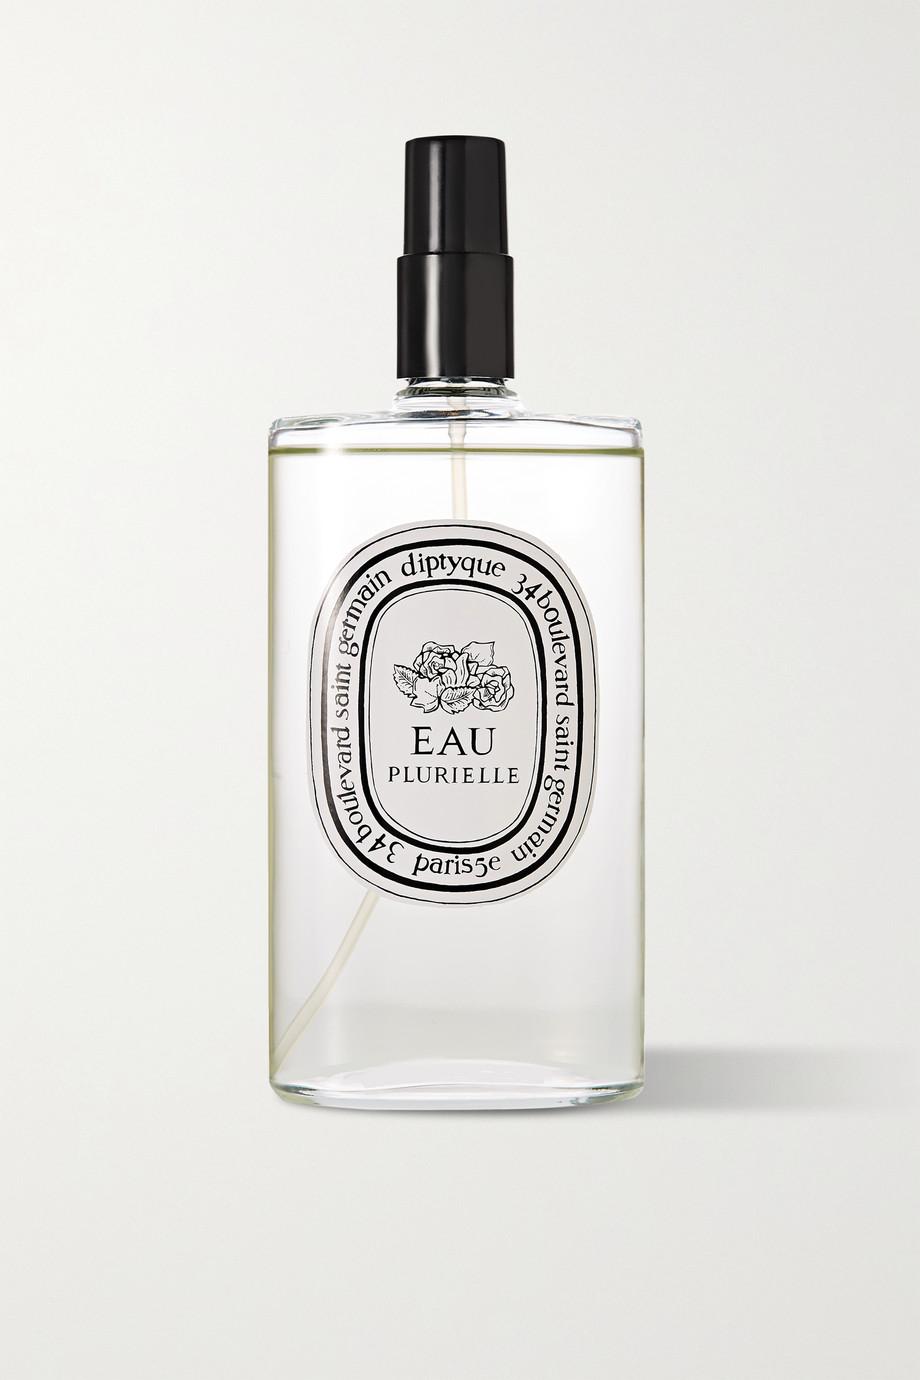 Diptyque Eau Plurielle Multi-use Fragrance - Rose & Ivory, 200ml